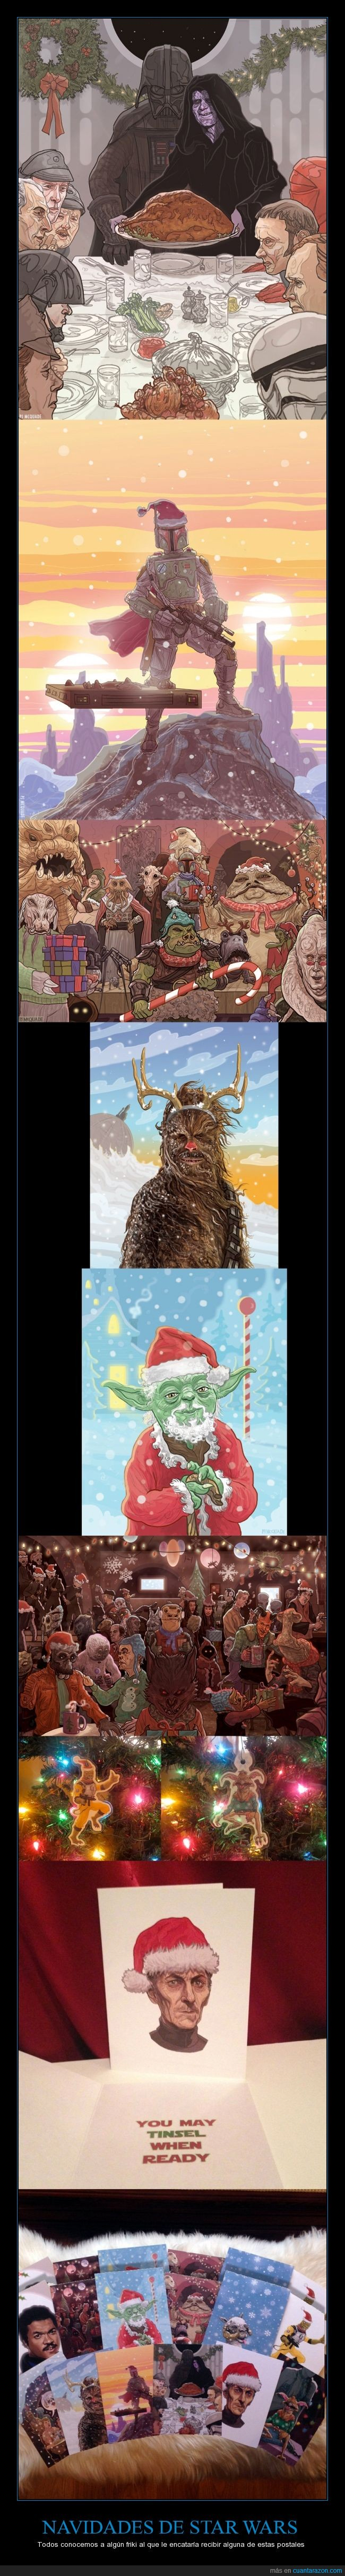 friki,gorro,la guerra de las galaxias,navidad,navideña,navideño,papa noel,PJ McQuade,postal,star wars,yoda